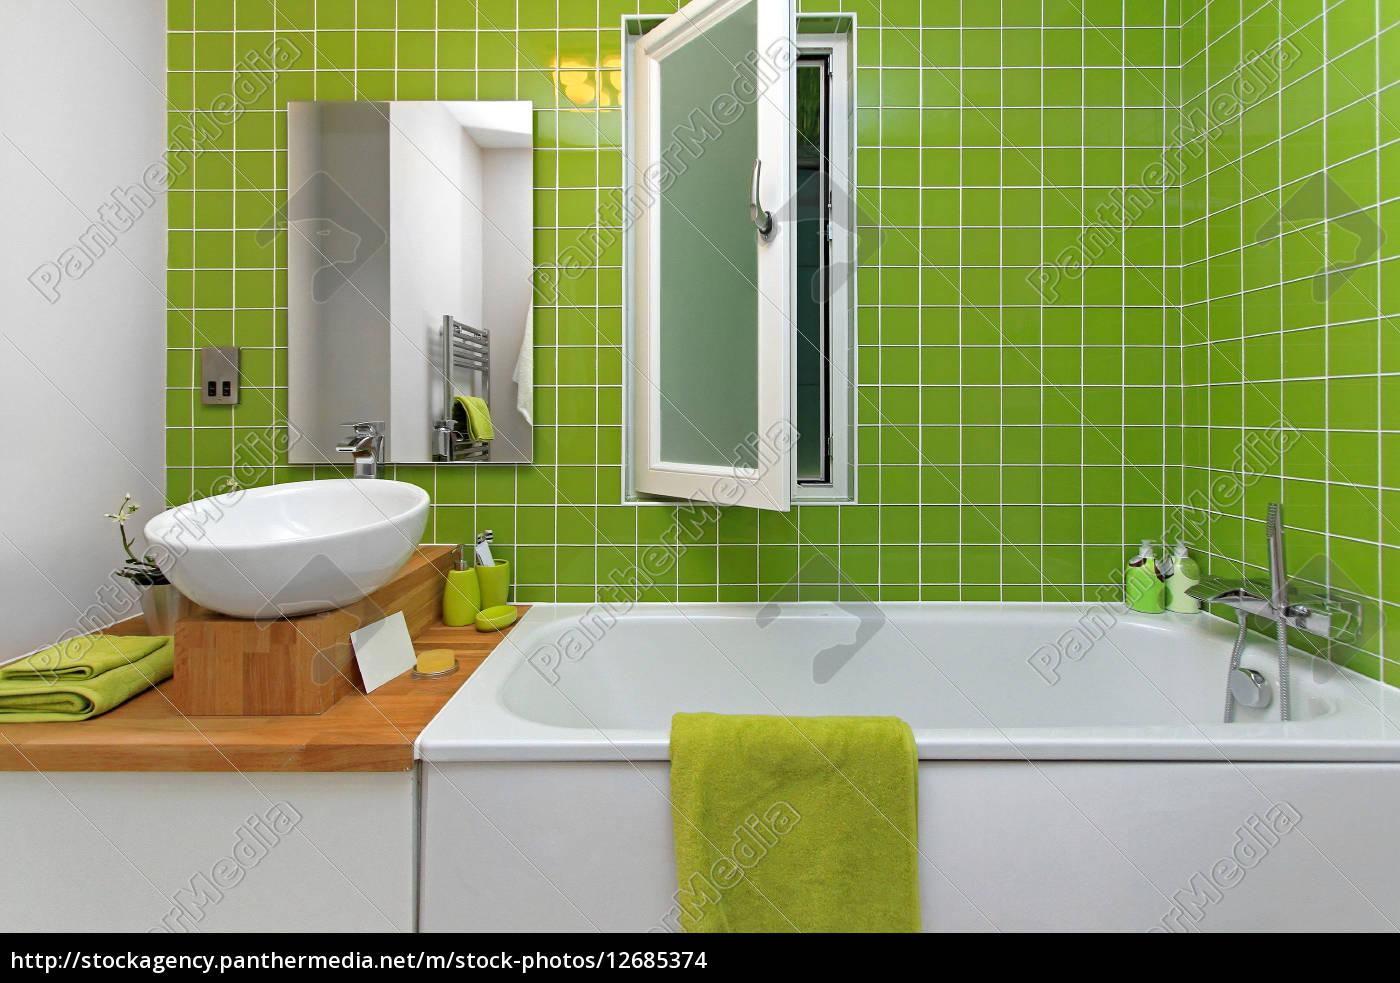 grünes badezimmer   Stockfoto   20   Bildagentur PantherMedia